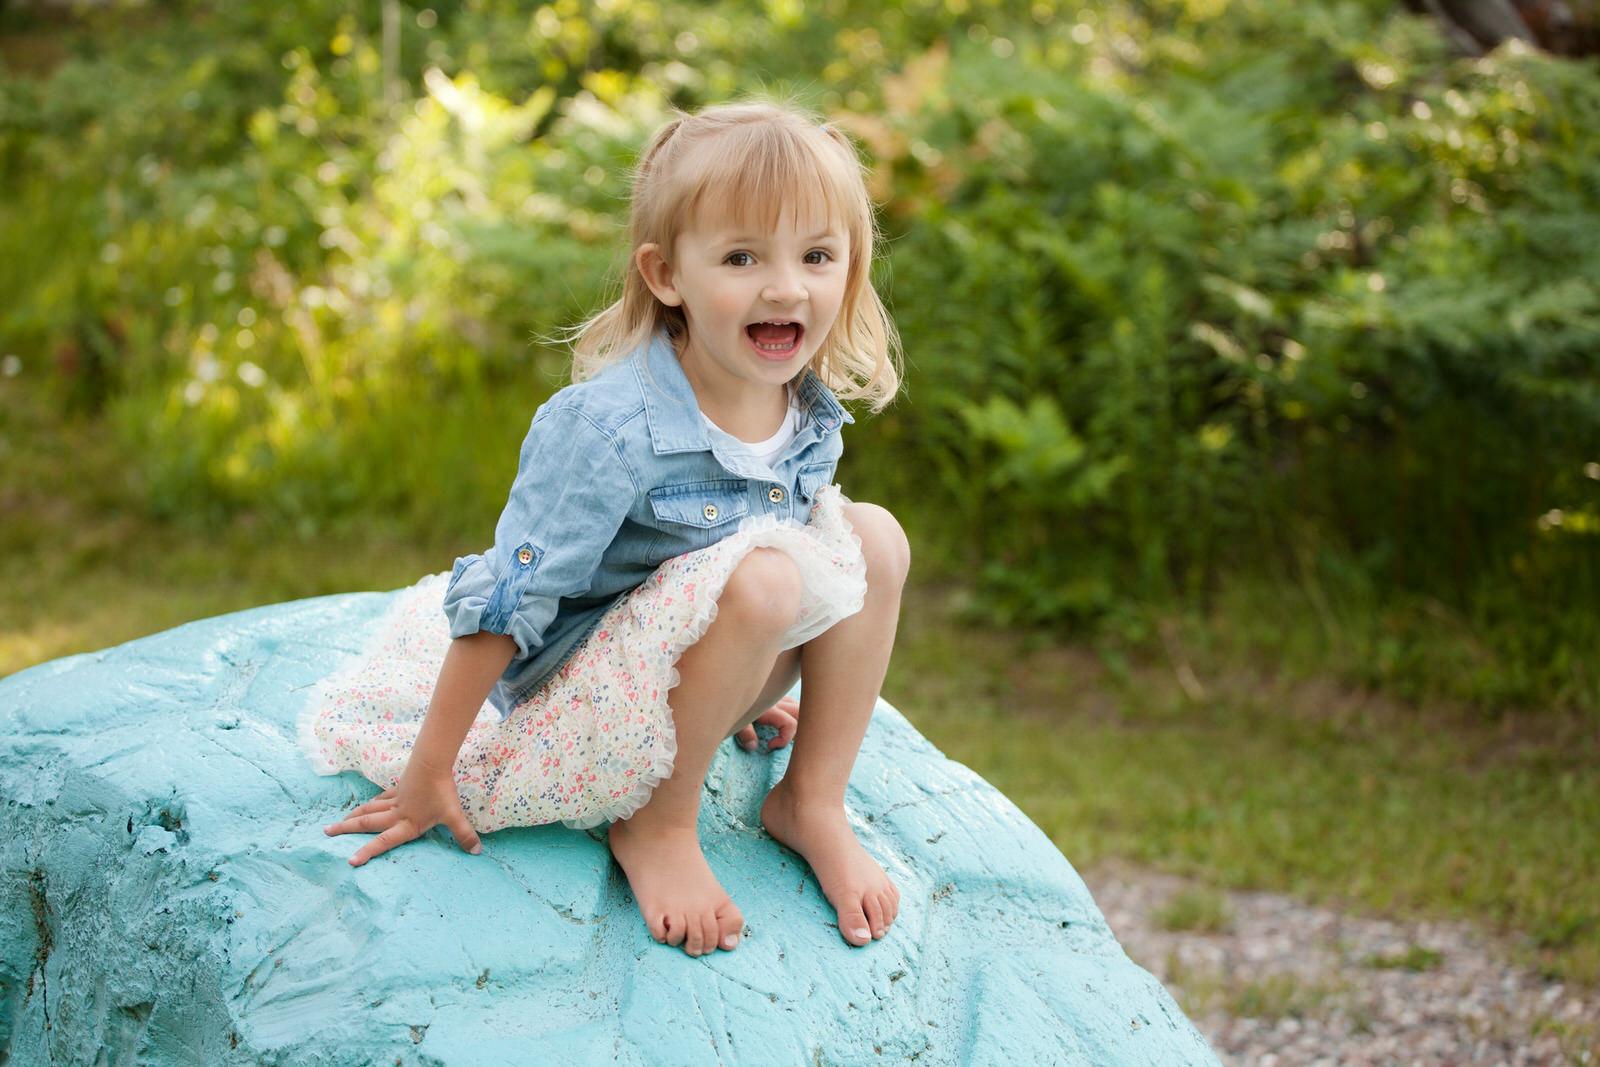 upper-peninsula-photographer-family-children-marquette-michigan-jackie-solomon-003.jpg